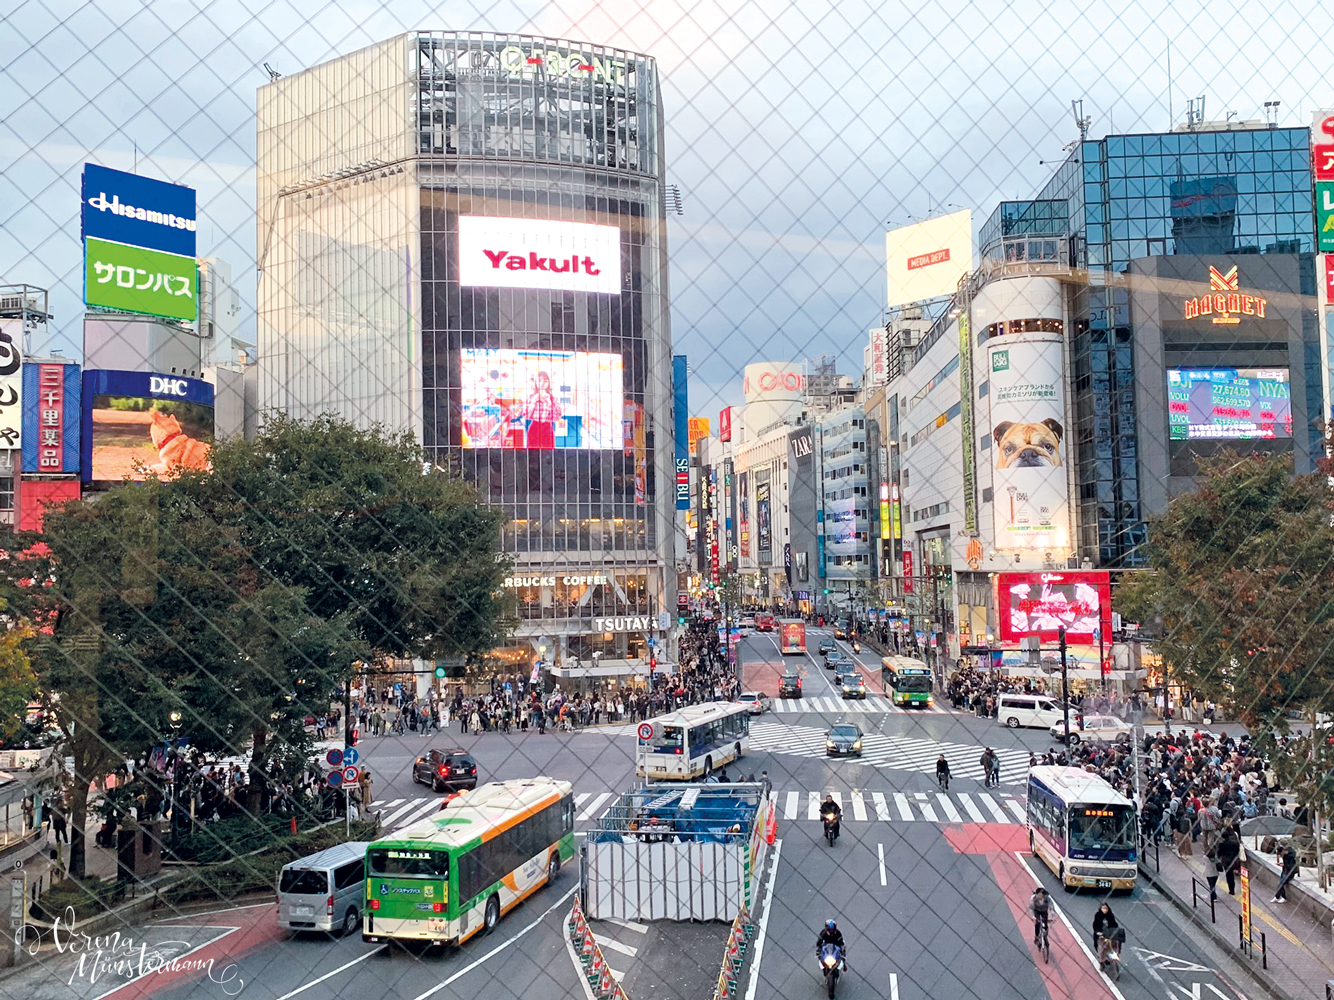 nach-Japan-reisen_tokio_laubfaerbung_shibuya_Crossing_verenamuenstermann